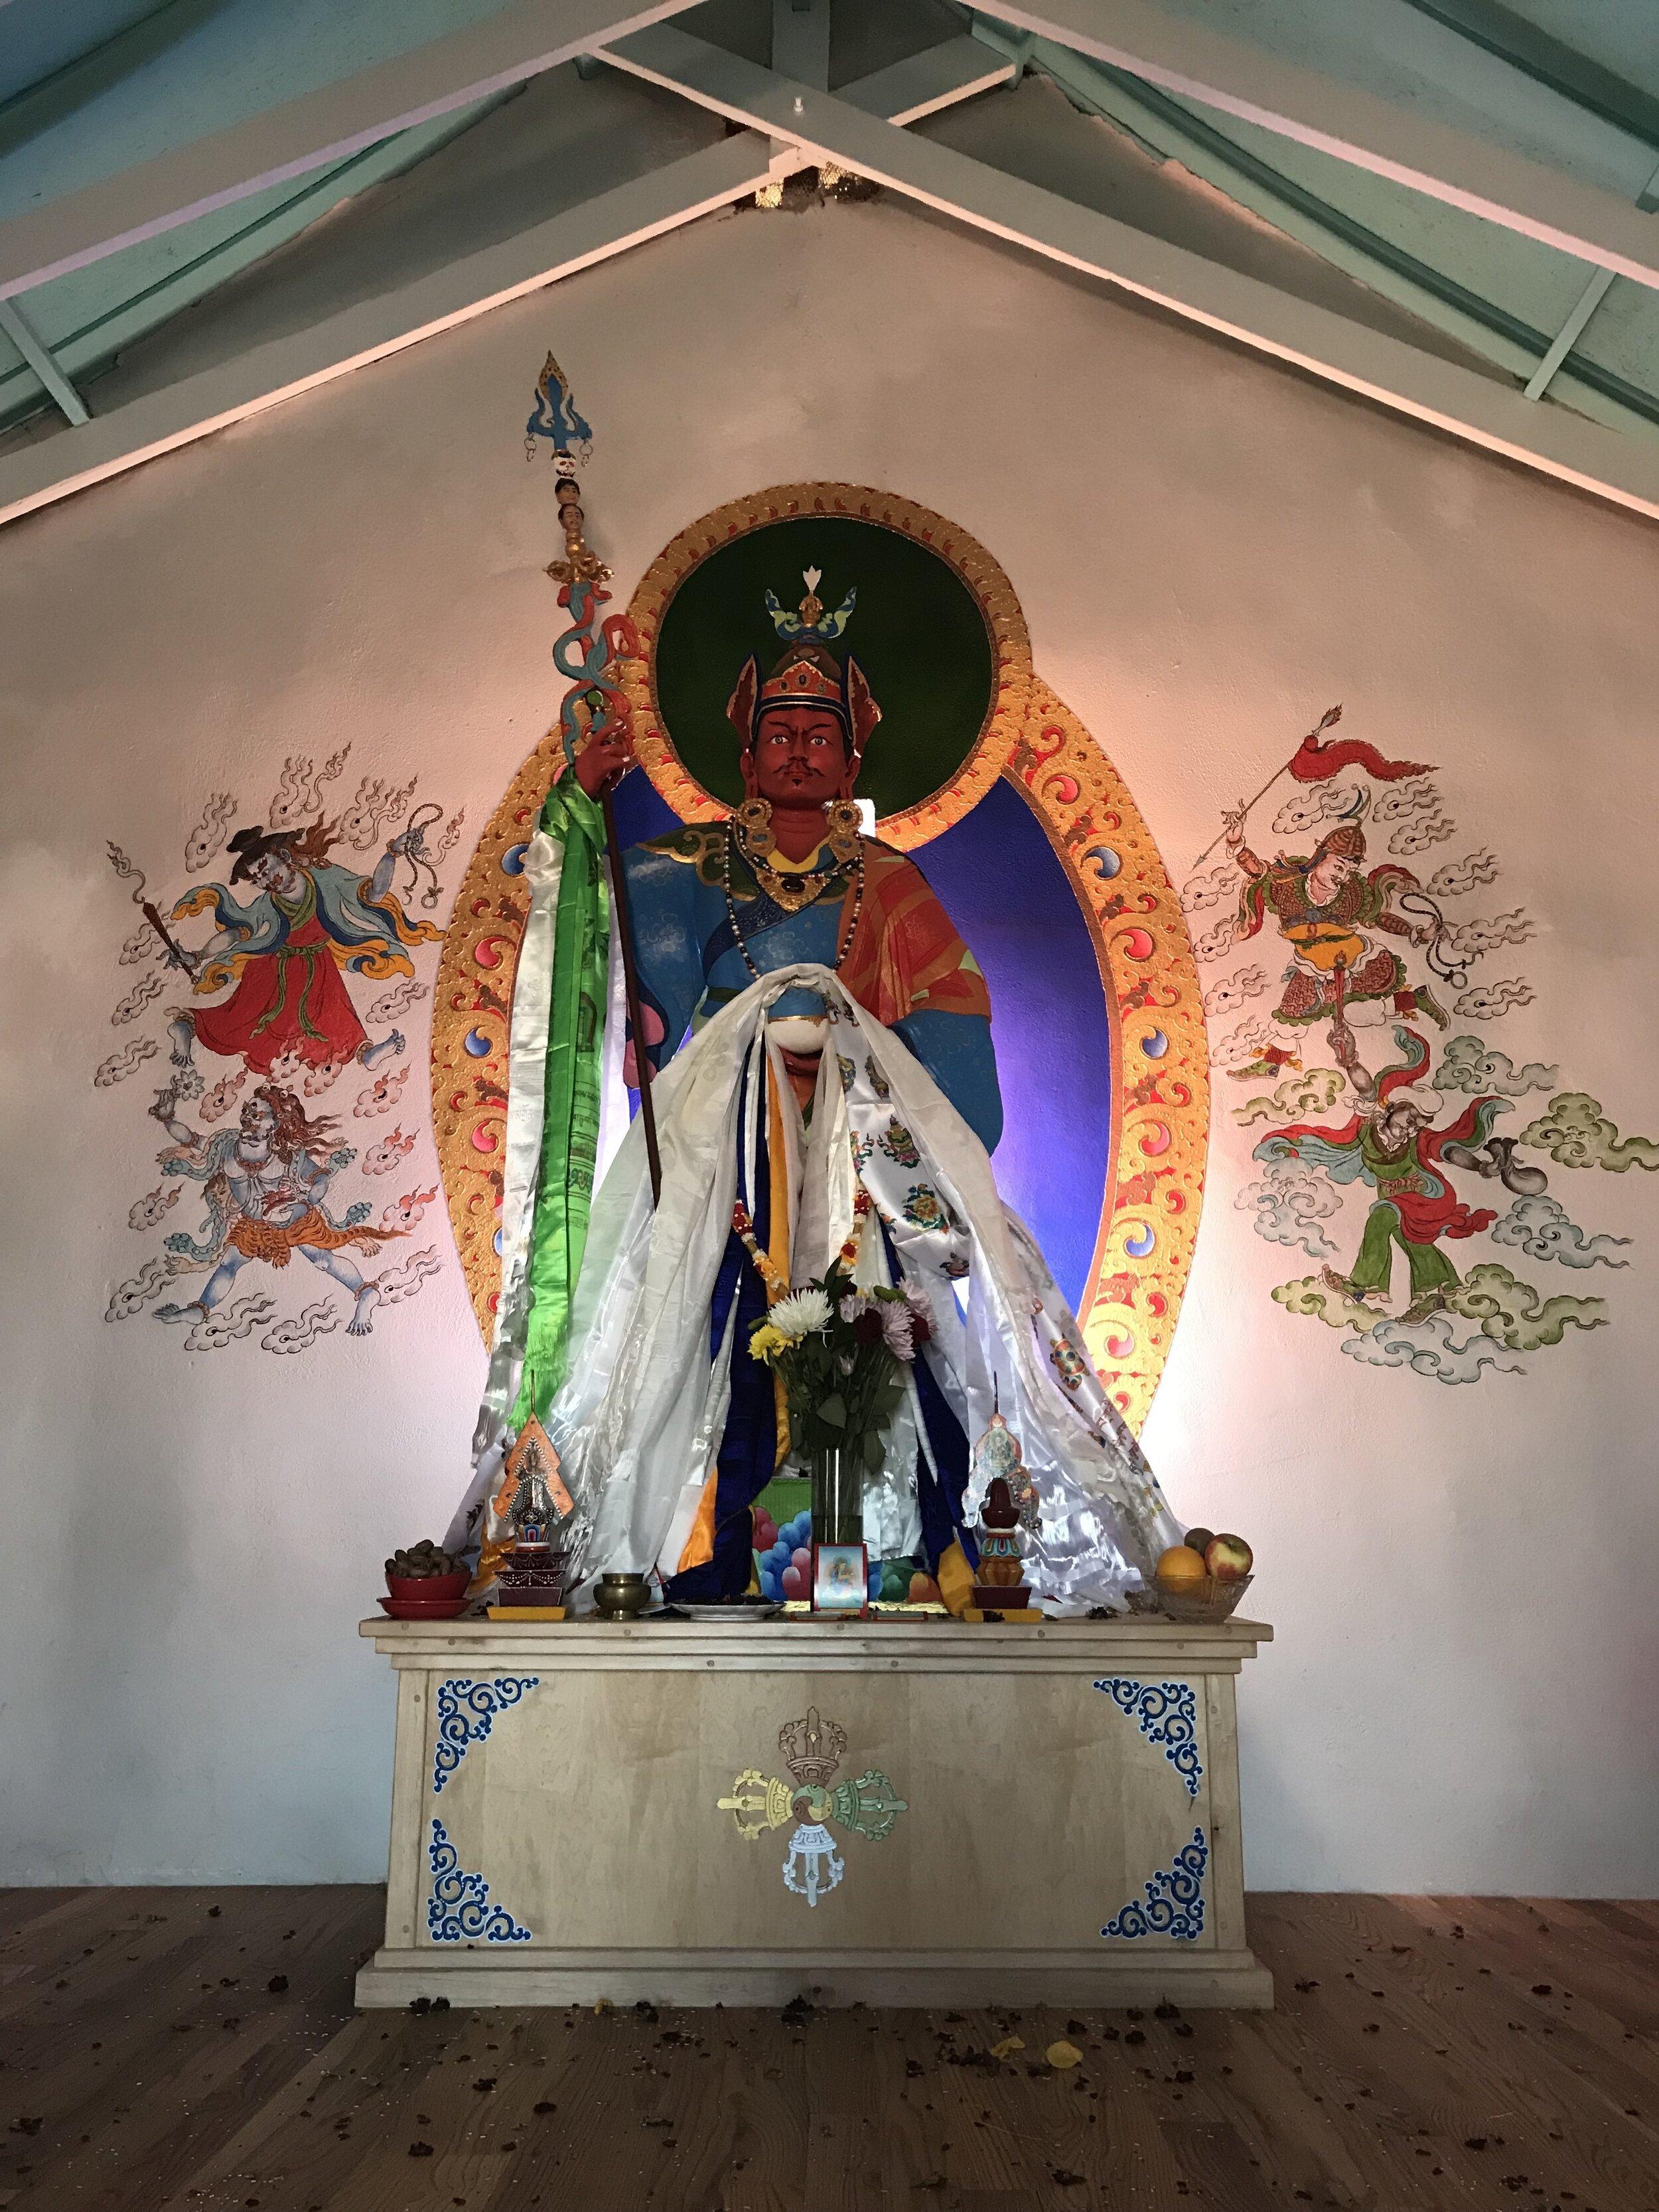 Sampa Lhundrumpma Statue at Orgyen Choling in Tularosa, NM